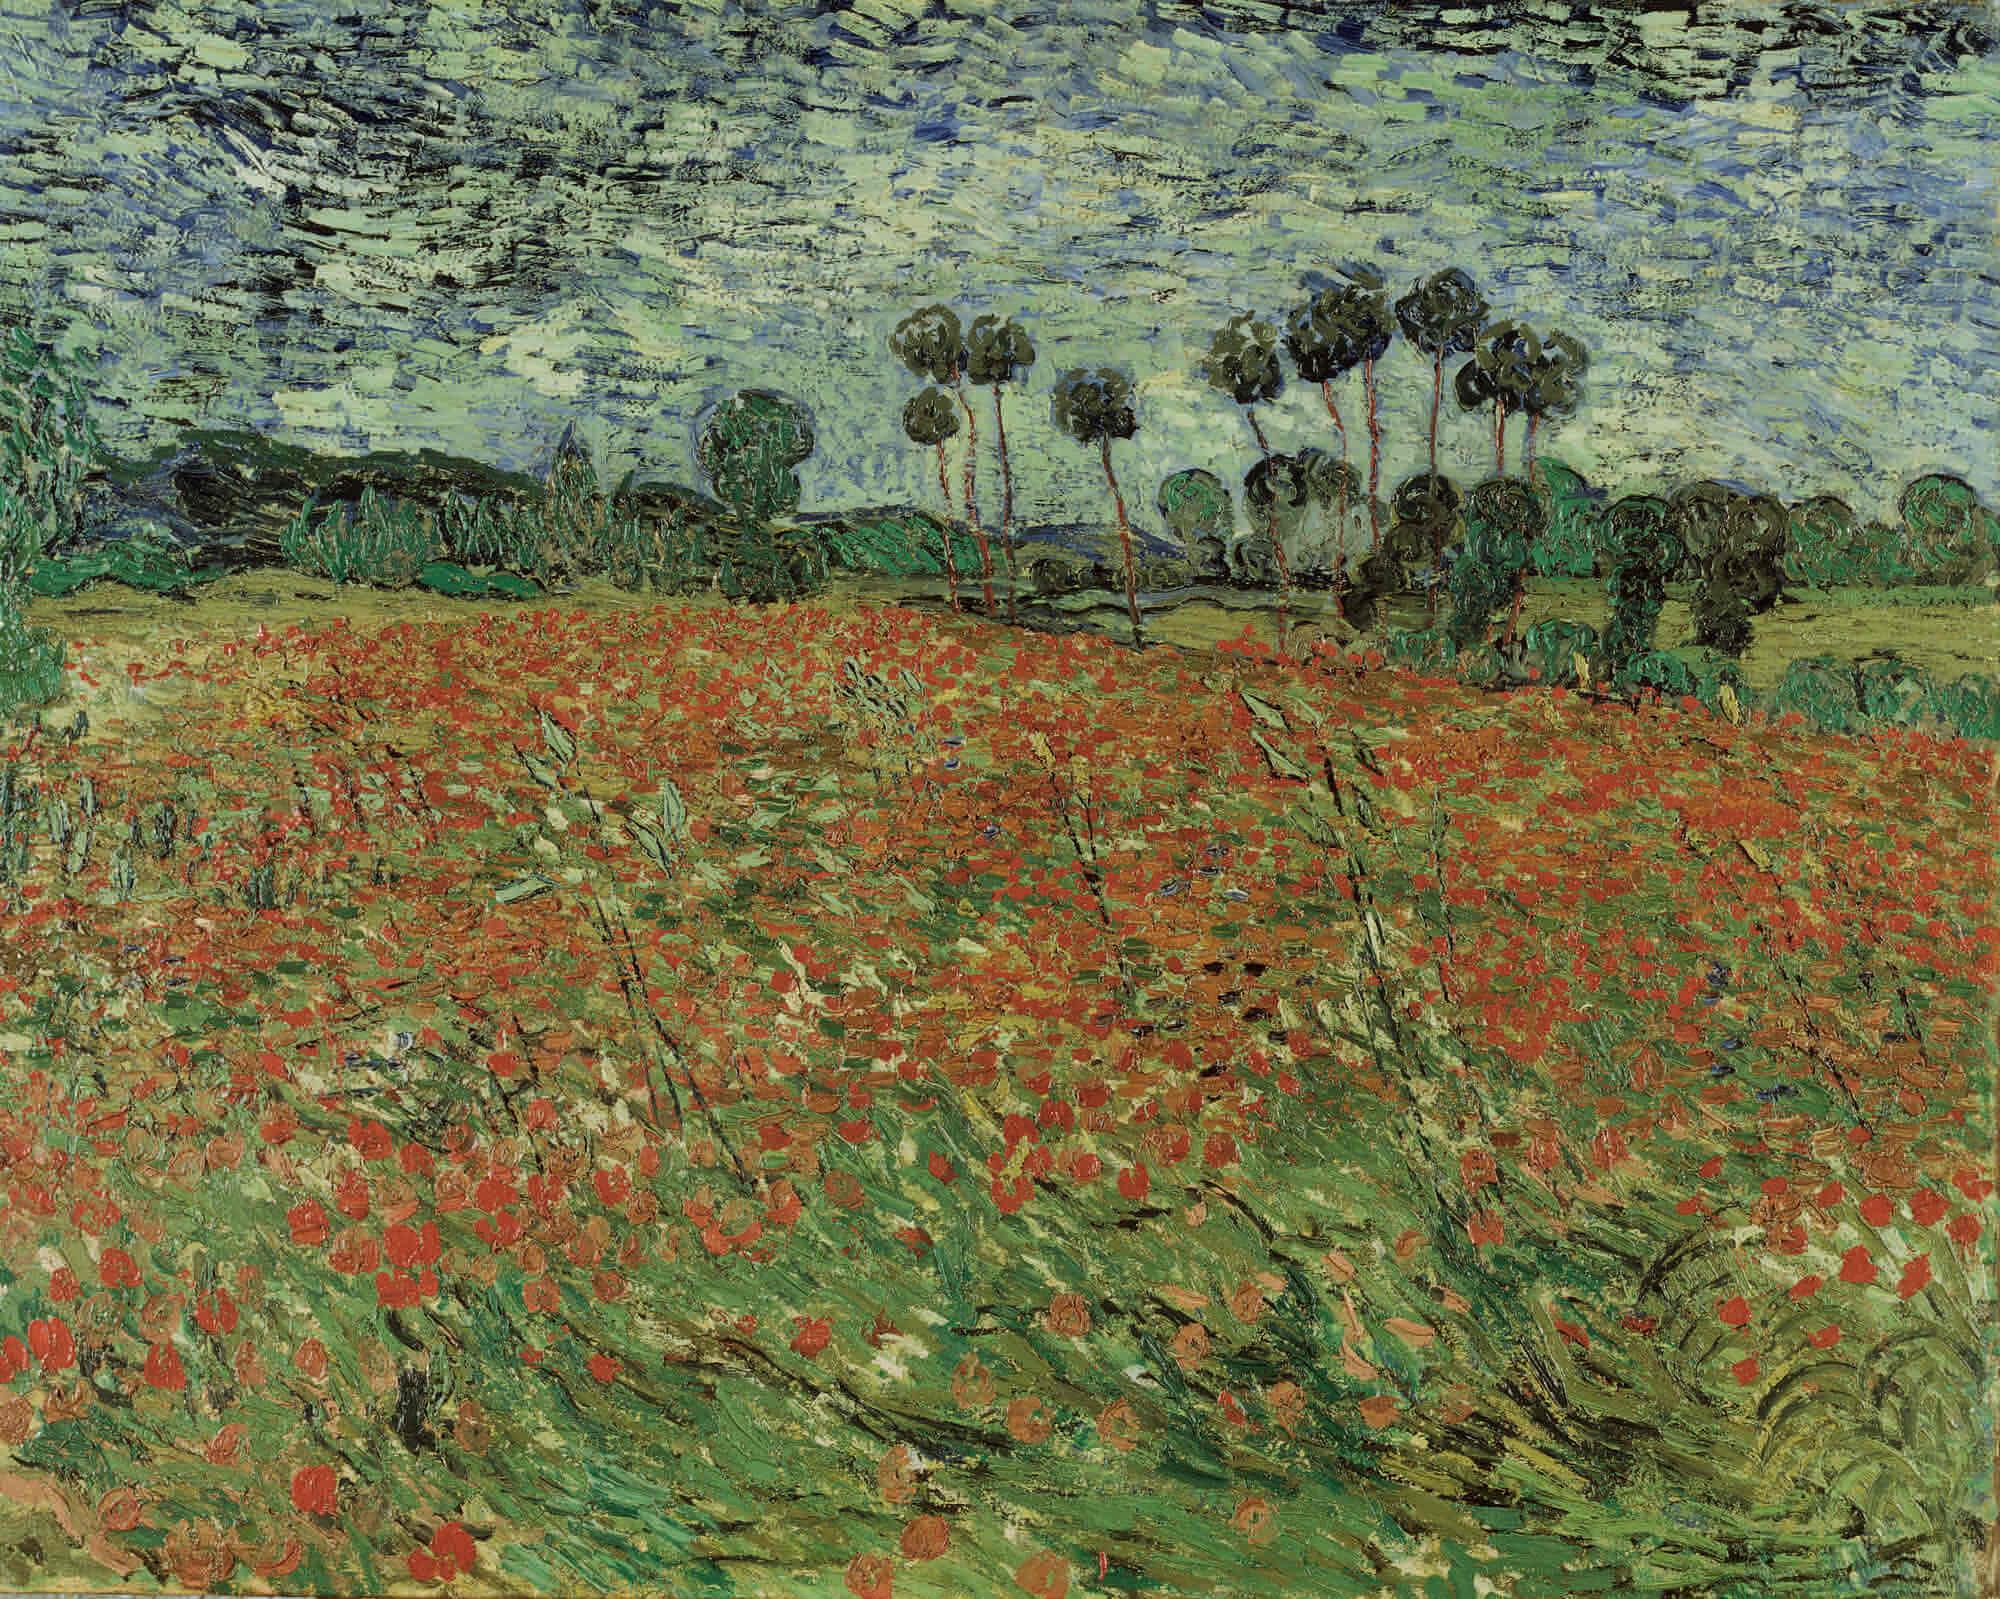 Vincent van Gogh - Papaverveld